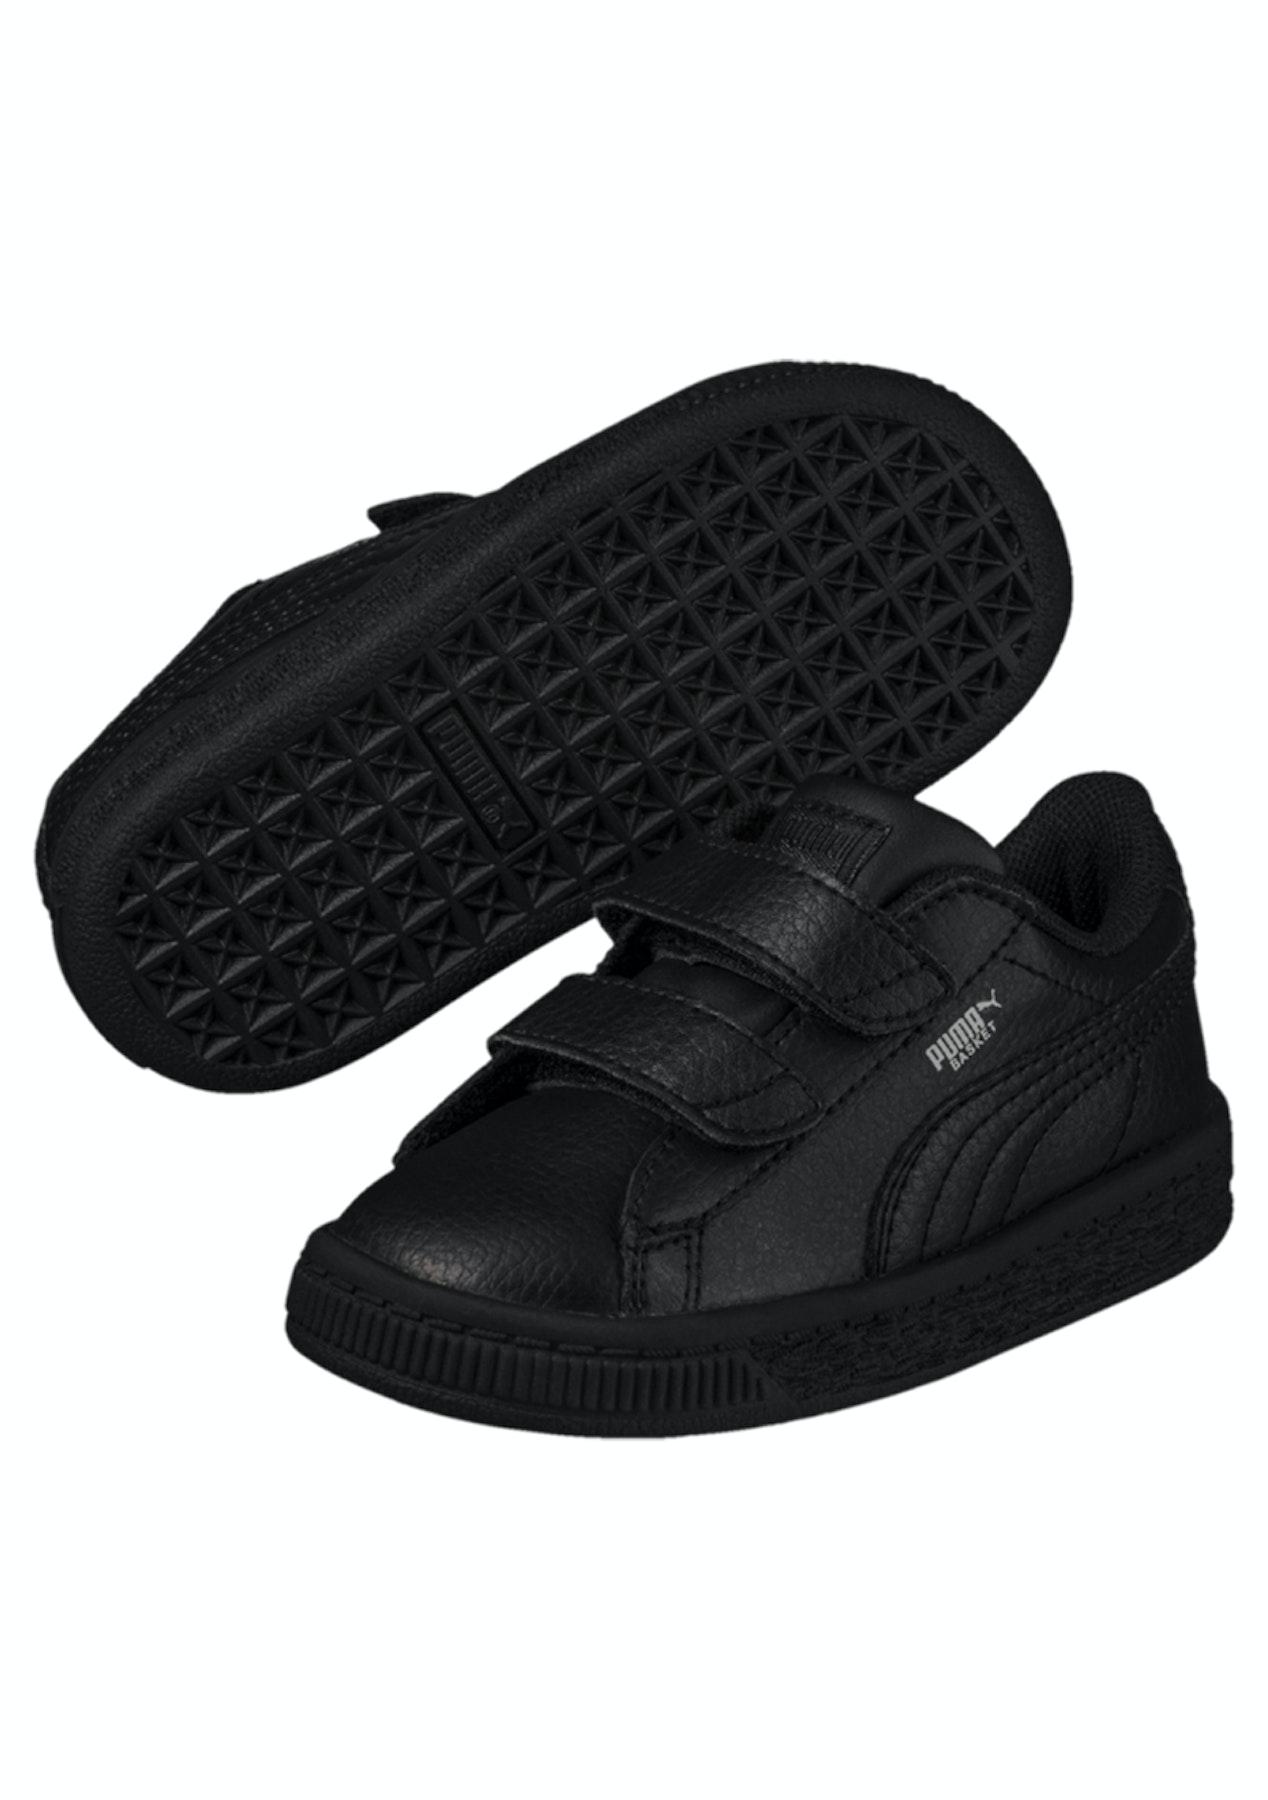 7e9e8a5137 Puma Kids - Basket Classic - Black